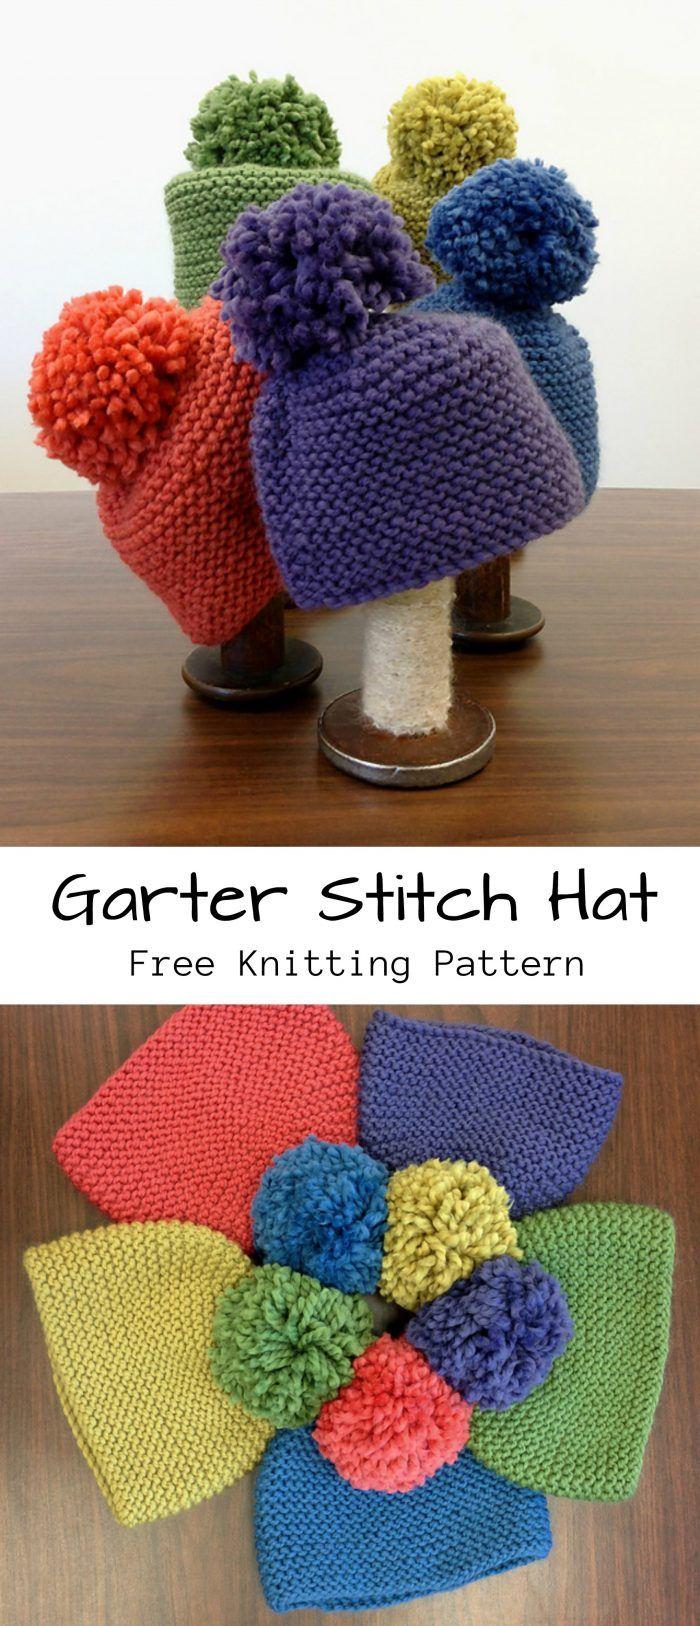 Garter Stitch Hat Free Knitting Pattern | Baby hat ...